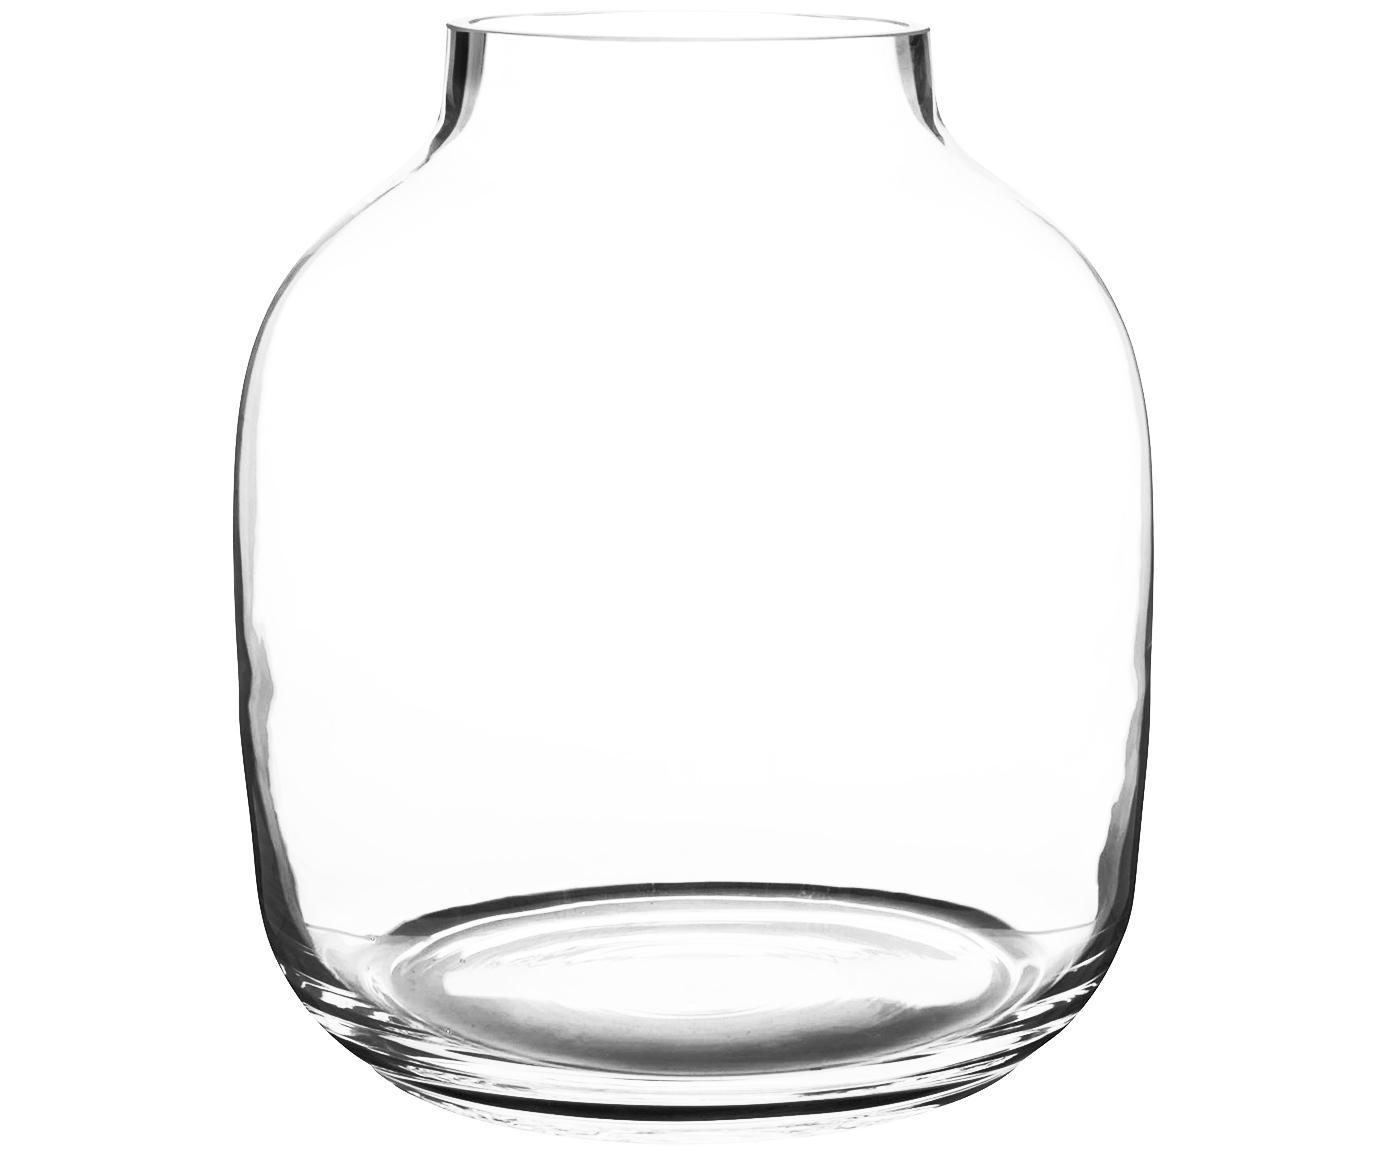 Grote glazen vaas Yanna, Glas, Transparant, Ø 26 x H 29 cm